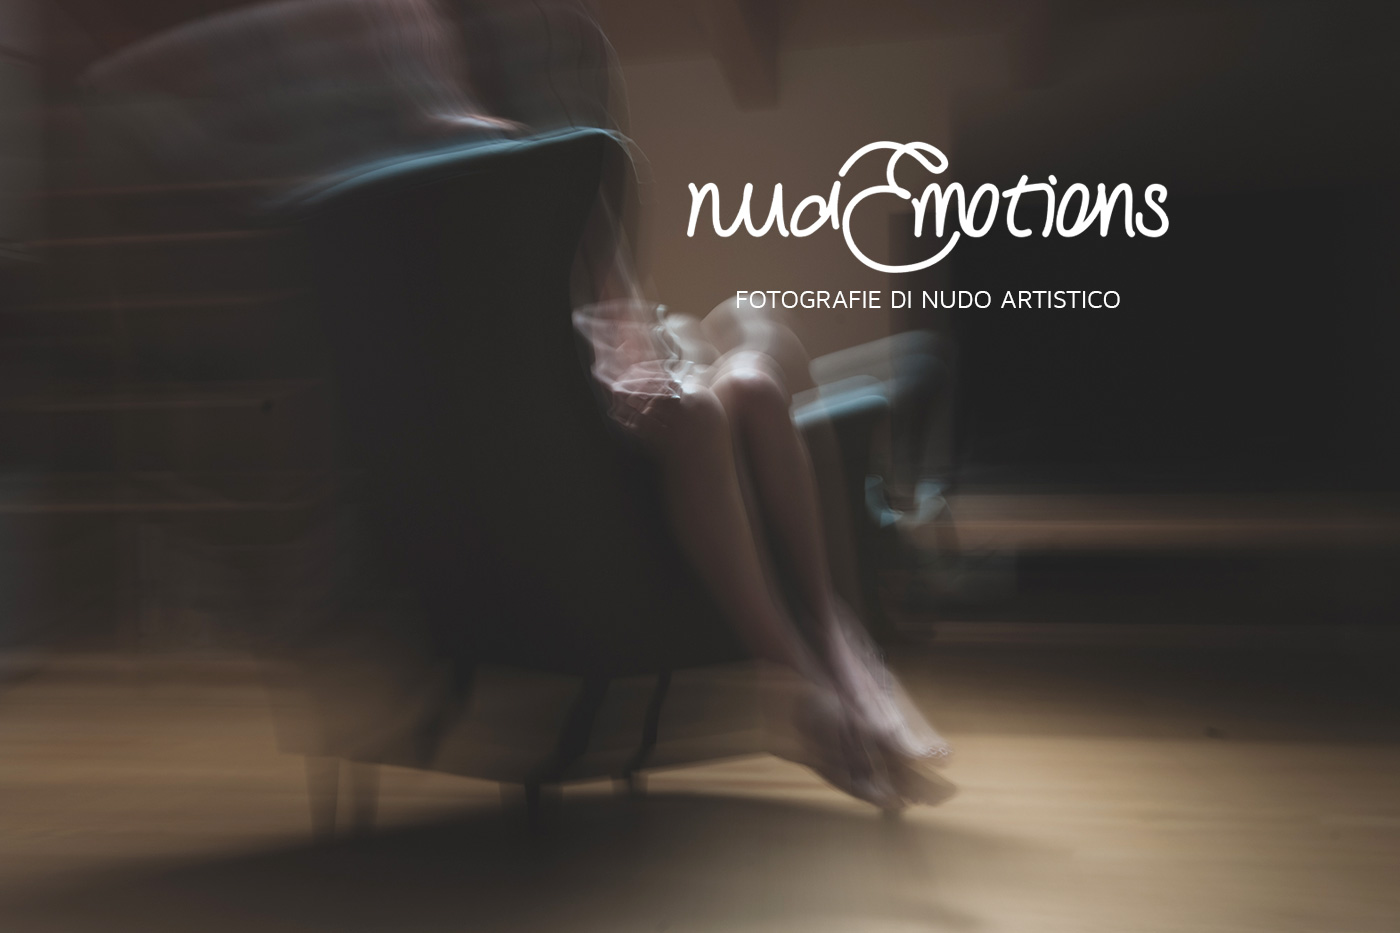 Nudemotions - Fotografie di nudo artistico